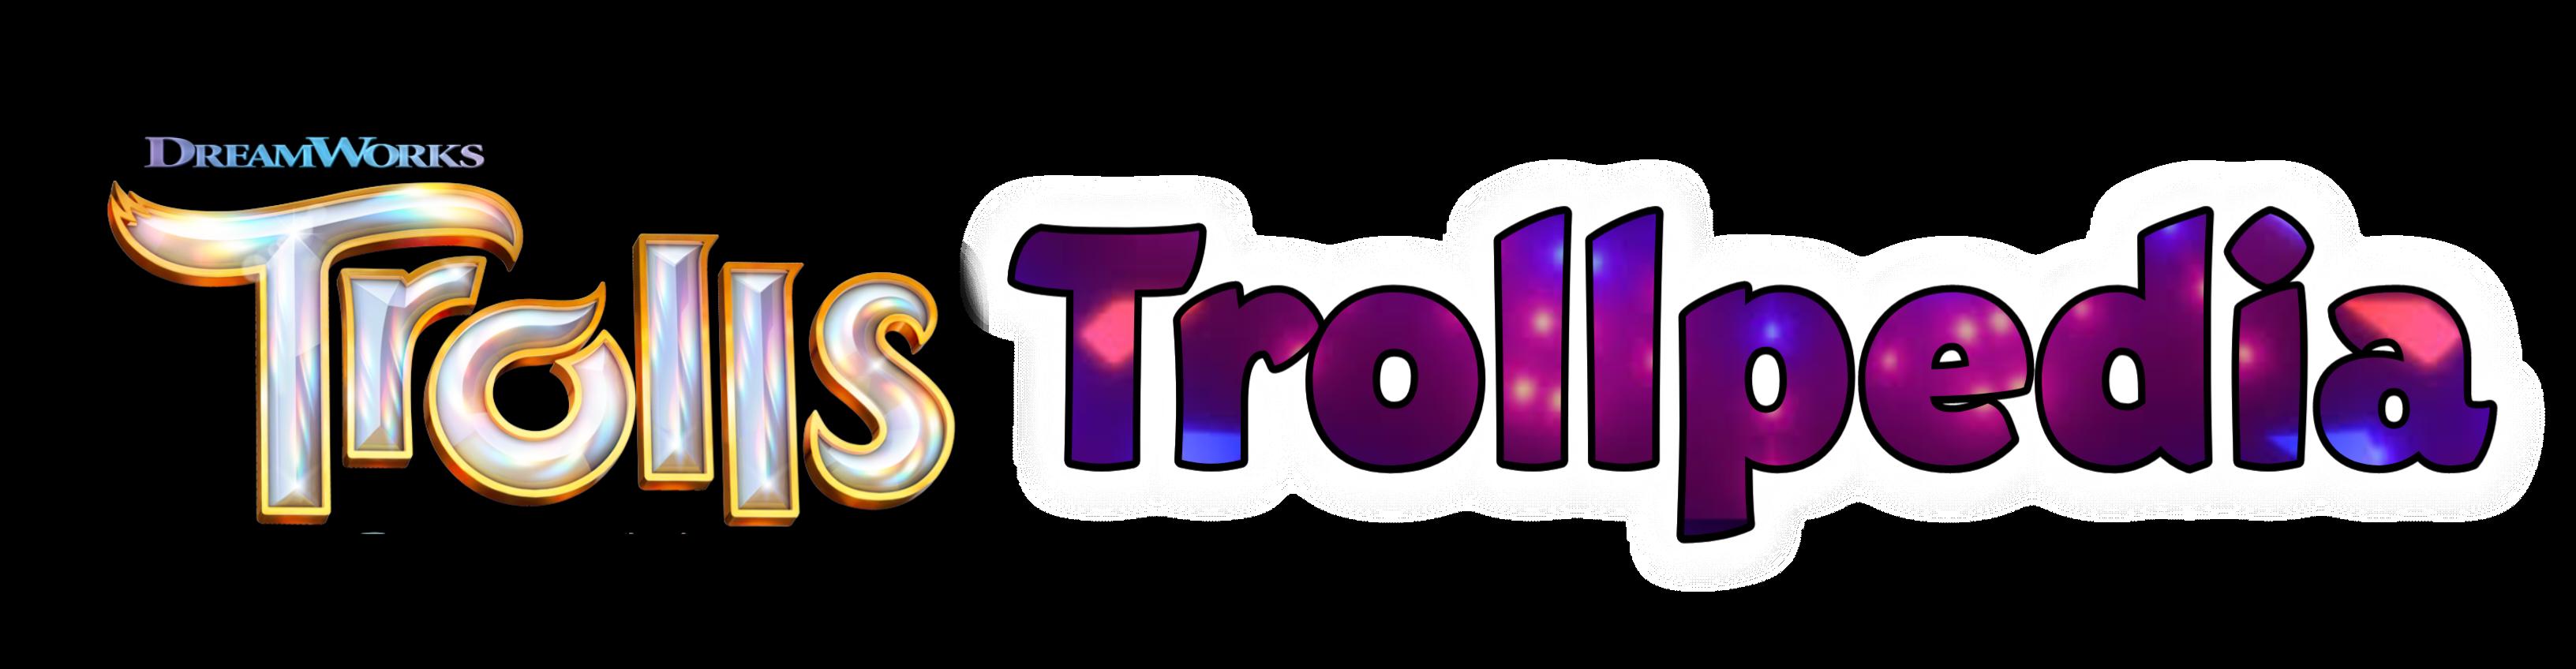 DreamWorks Trolls Wiki